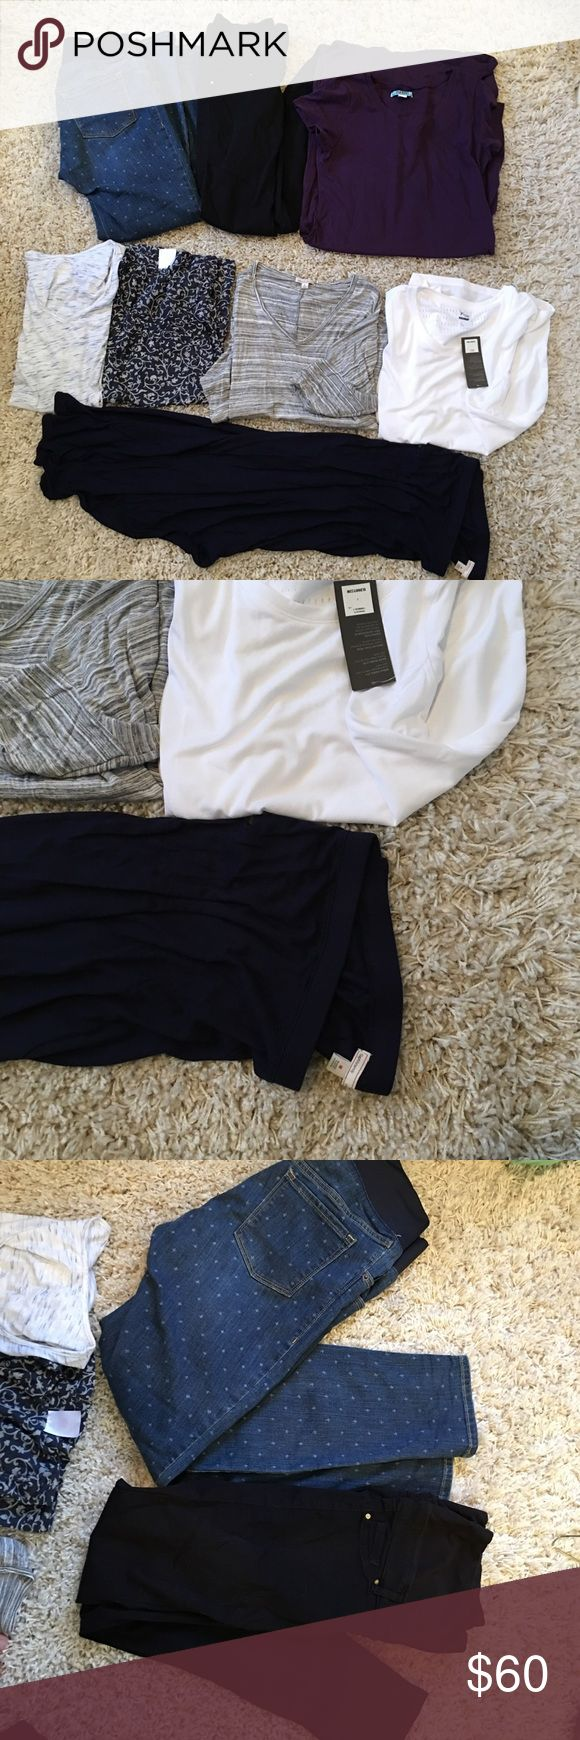 Black t shirt old navy - H M Old Navy Gap